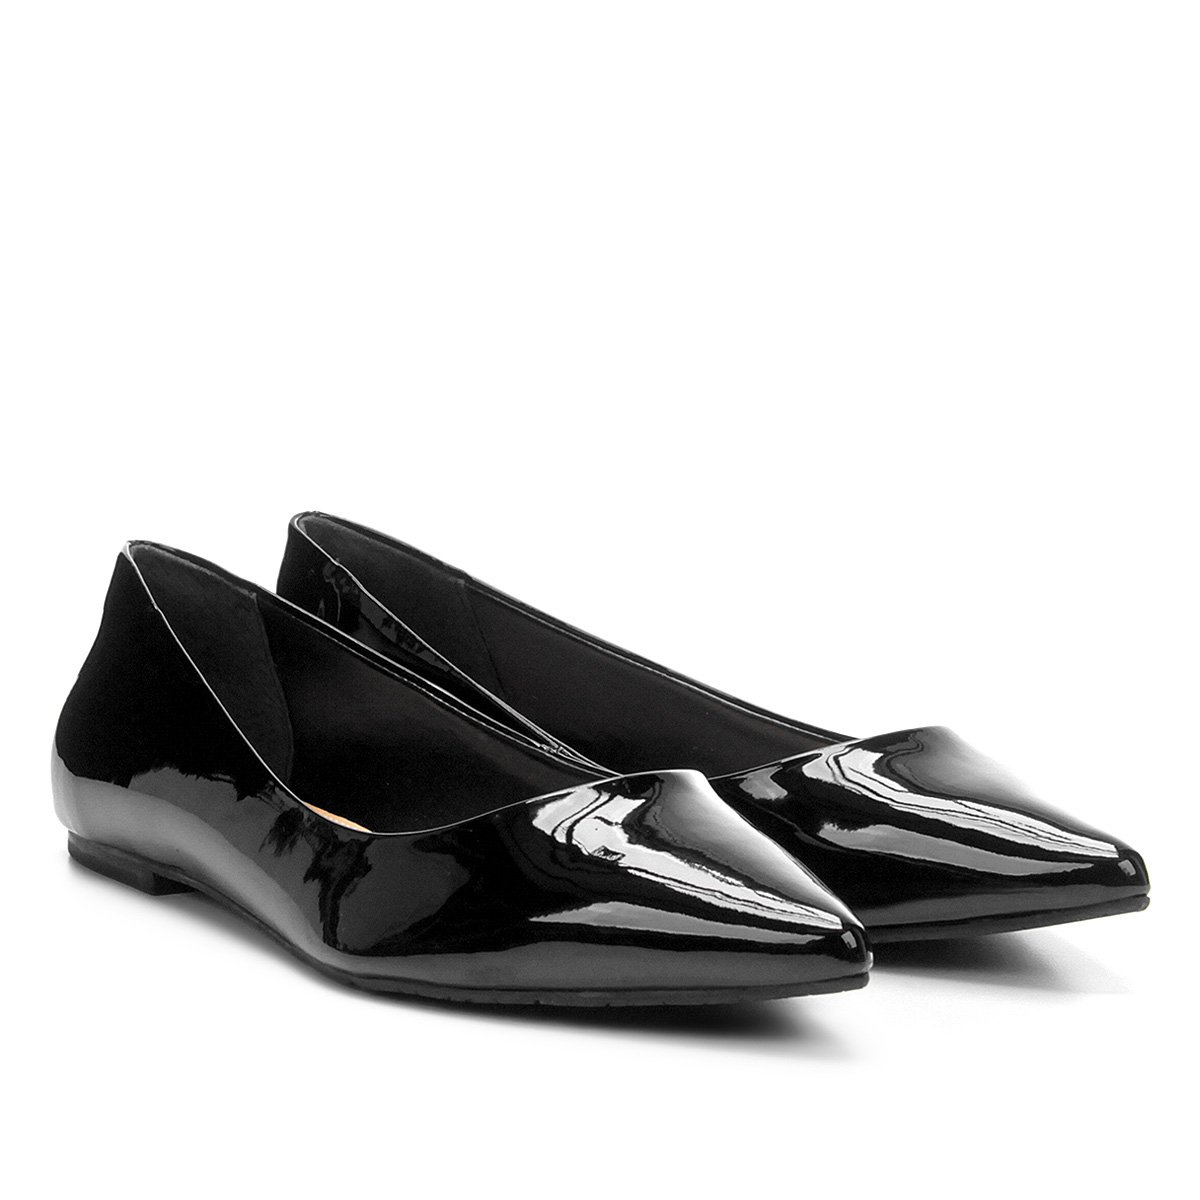 Shoestock Básica Bico Sapatilha Fino Fino Preto Feminina Básica Básica Preto Bico Shoestock Shoestock Sapatilha Feminina Sapatilha BUTwTqxEP